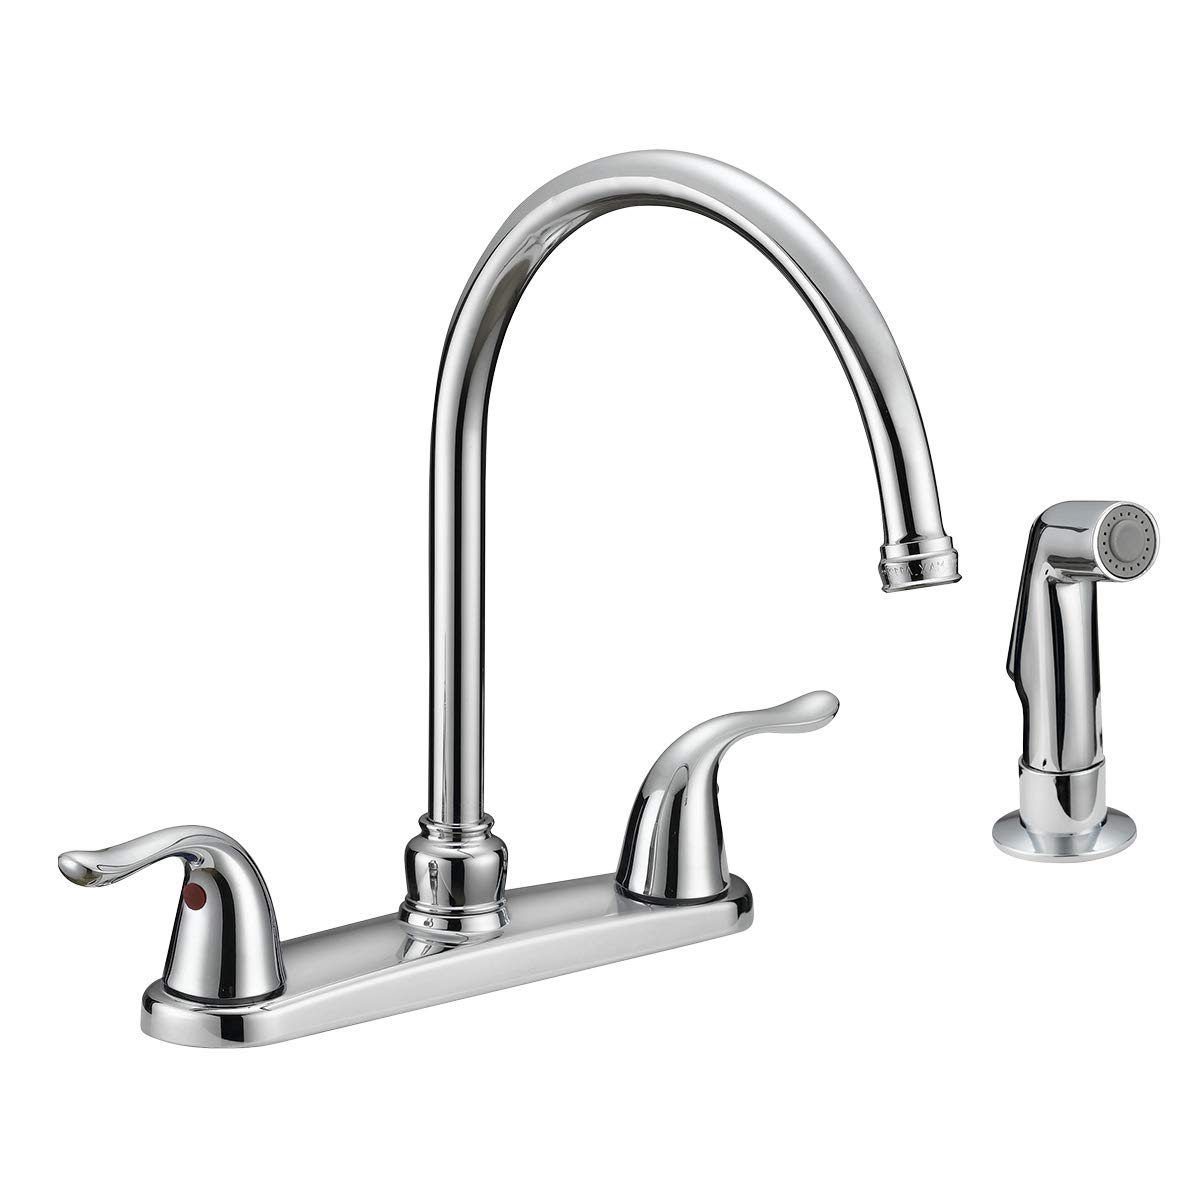 EZ-FLO 10201 Two-Handle Kitchen Faucet with Spray, Chrome by EZ-Flo